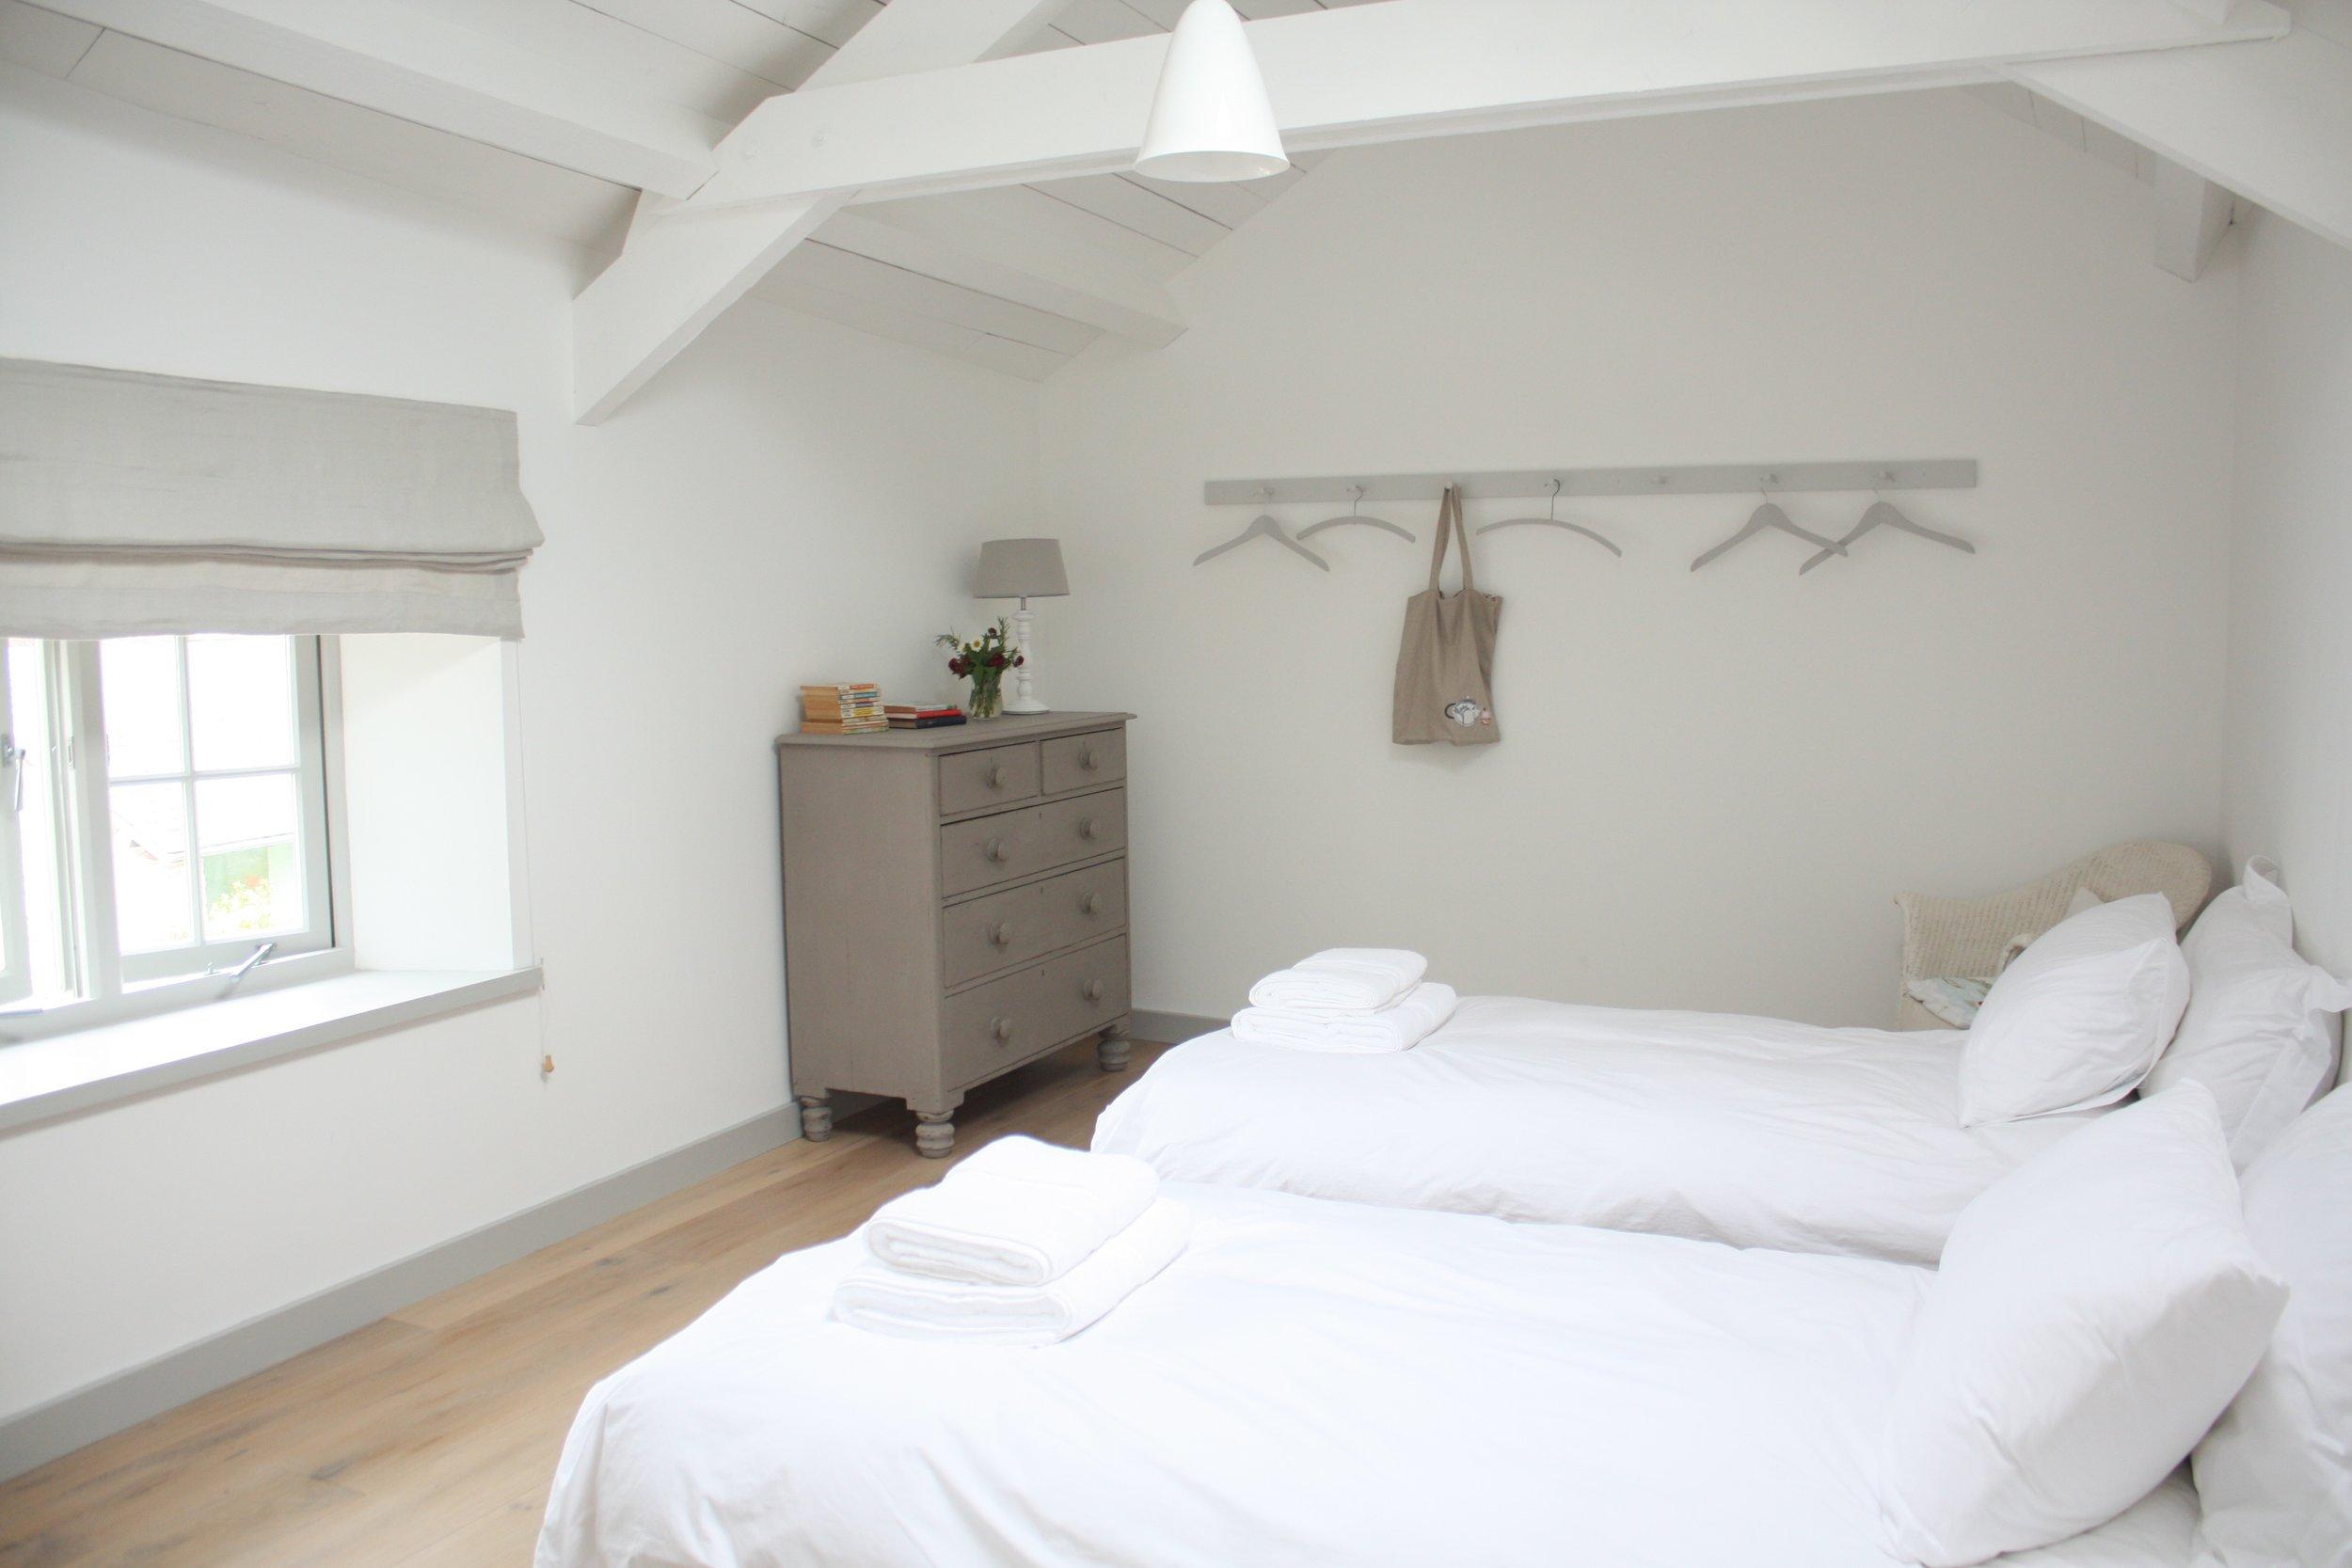 Upcott Farm Calfshed Bedroom